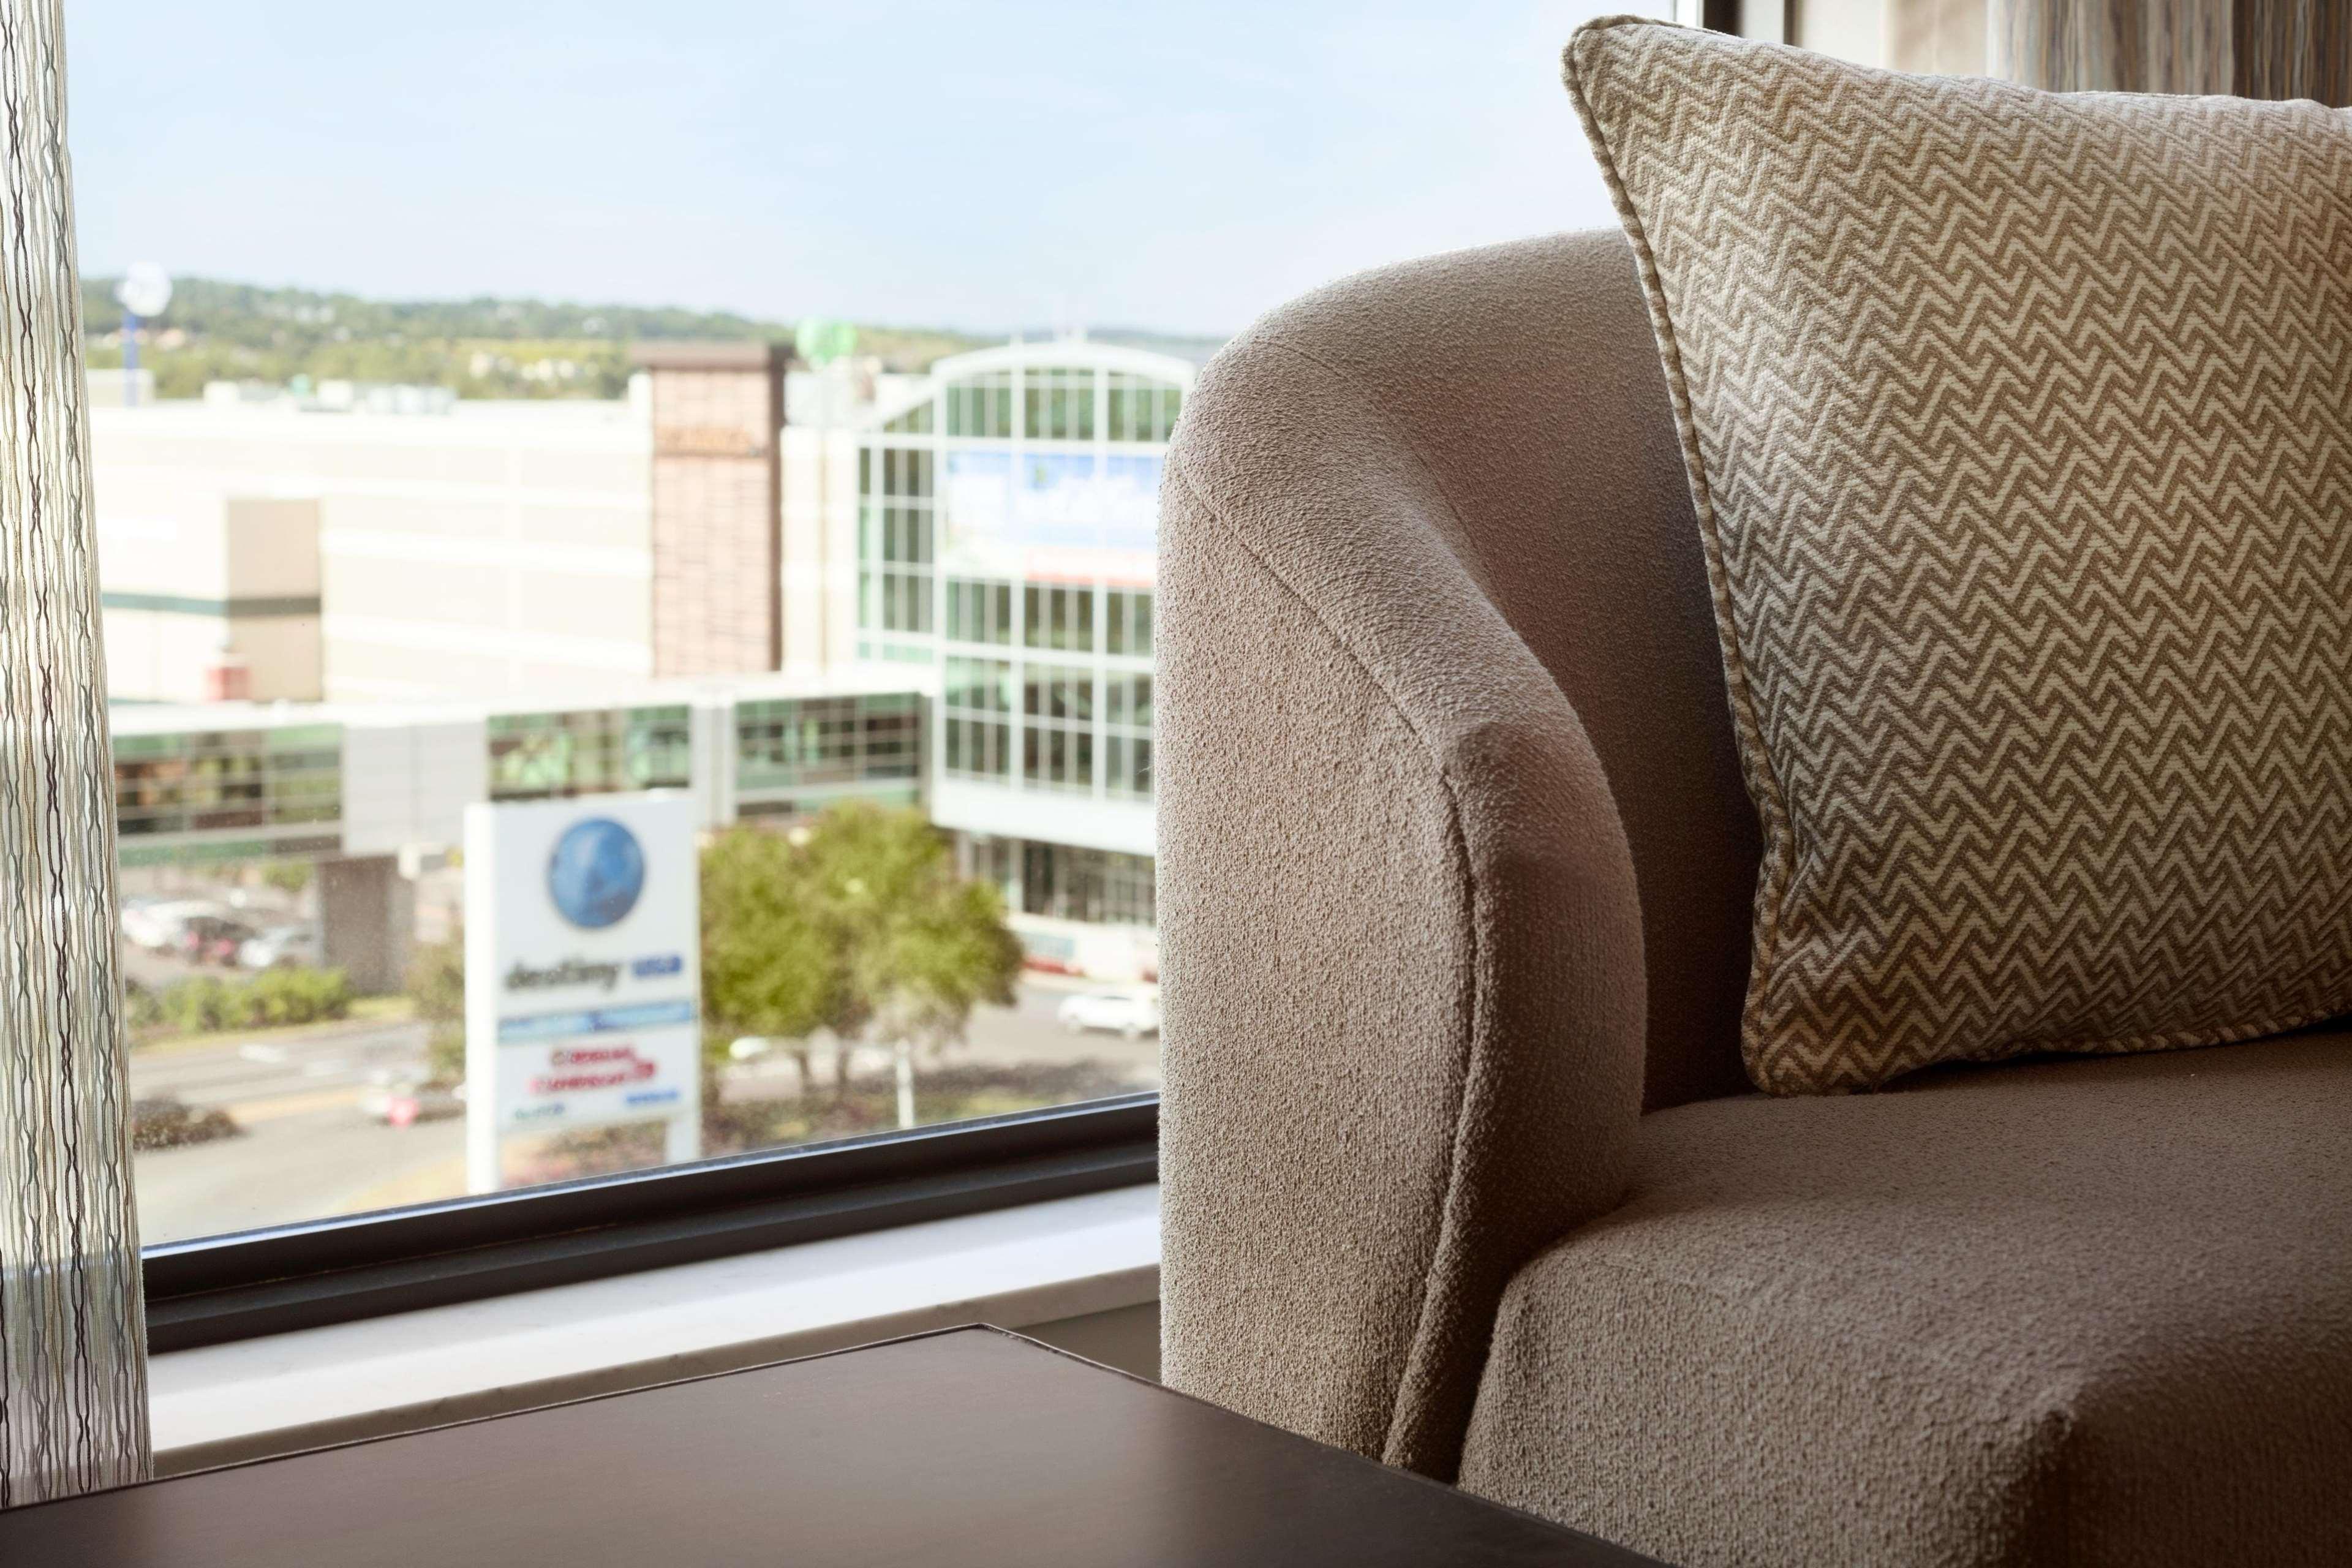 Embassy Suites by Hilton Syracuse Destiny USA image 14